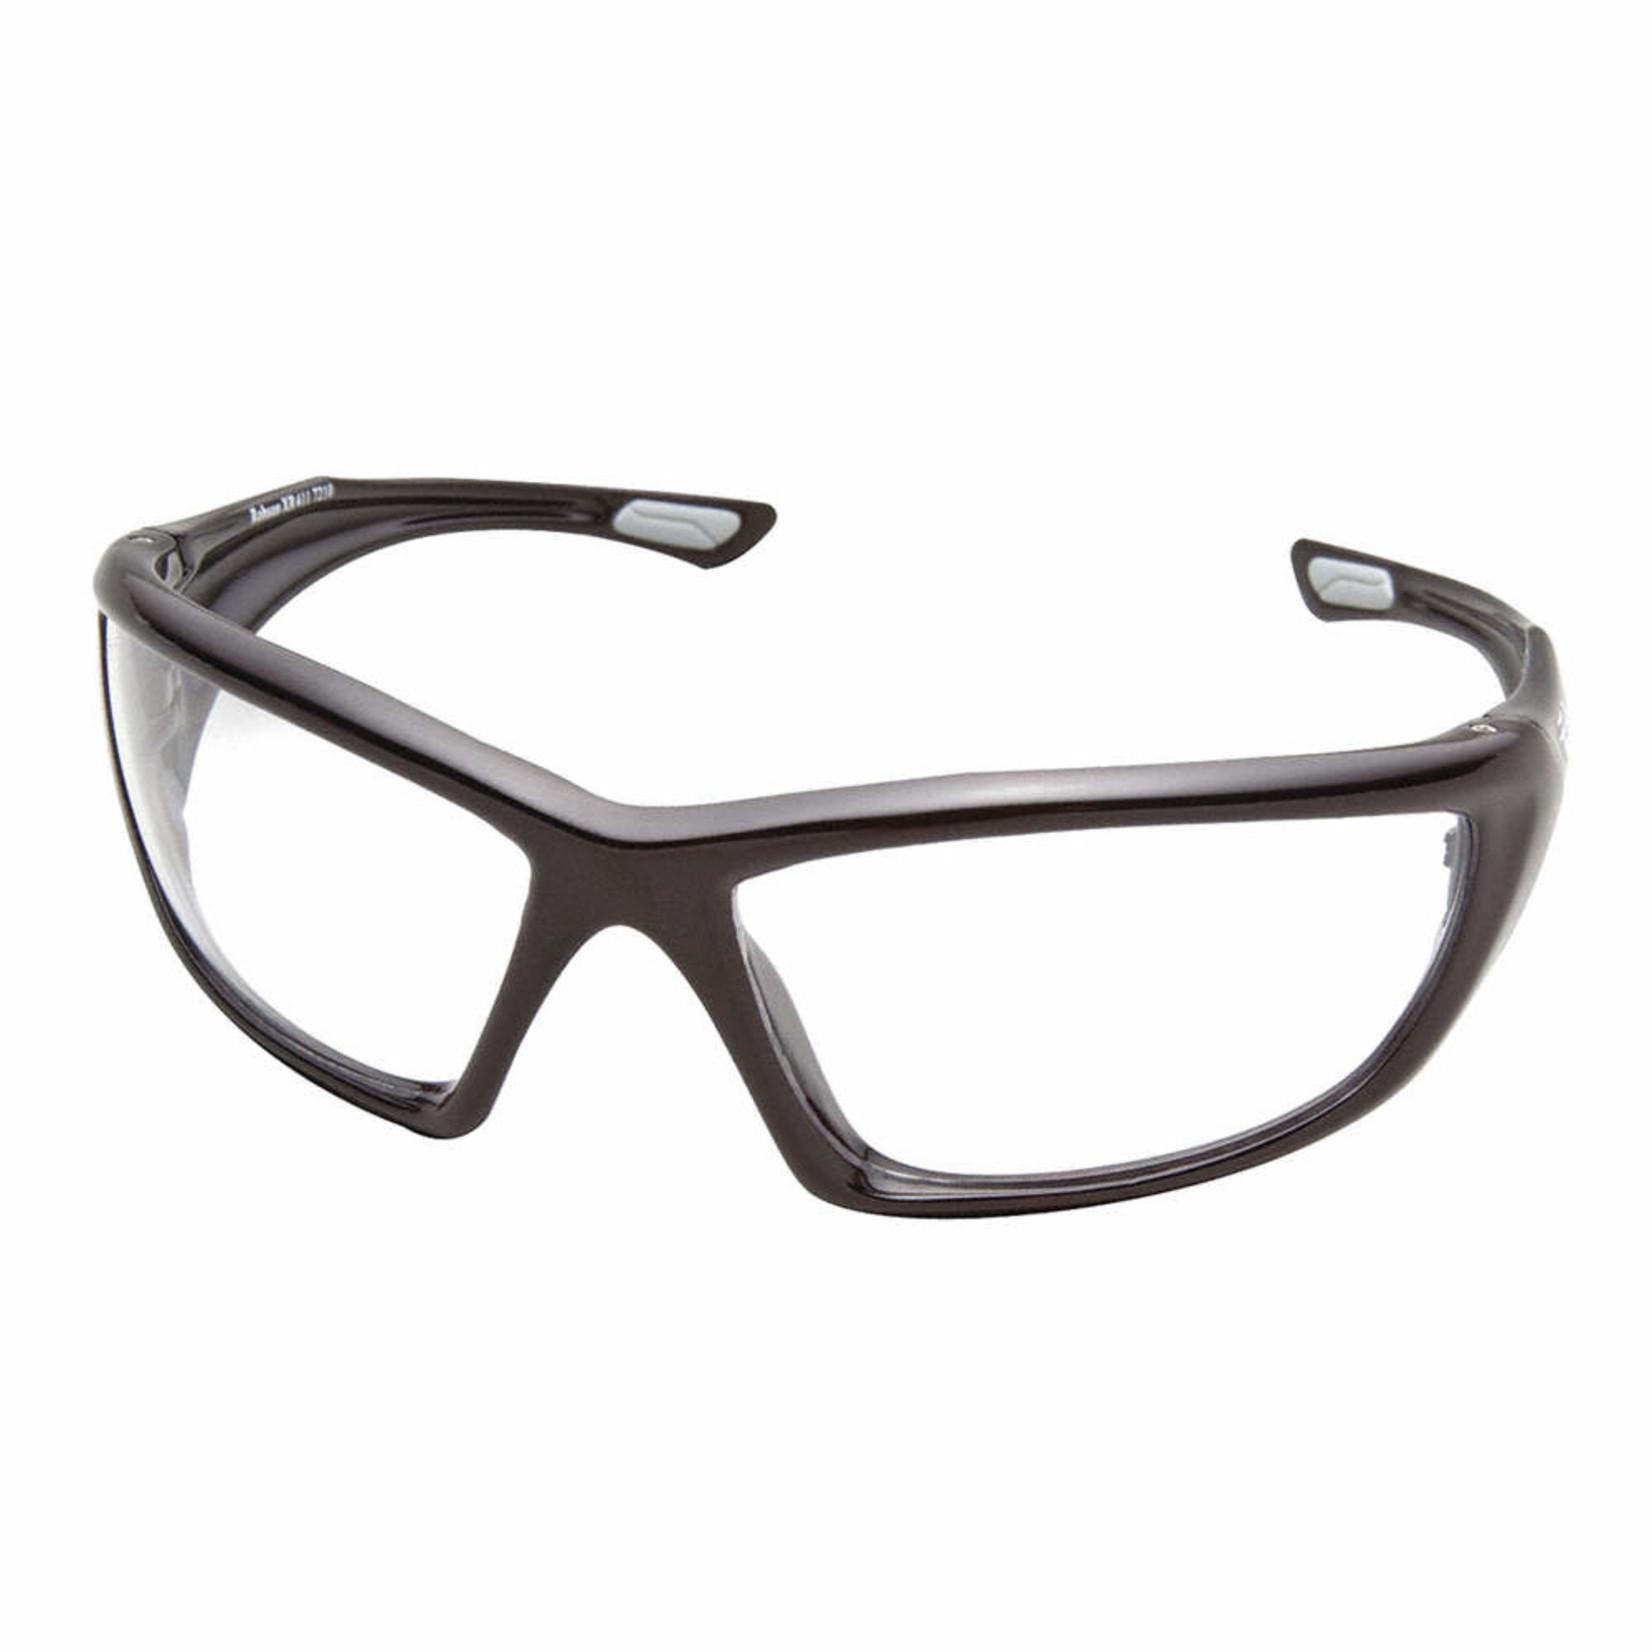 Edge Eywear ROBSON Safety Glasses -Black with Clear lens XR411